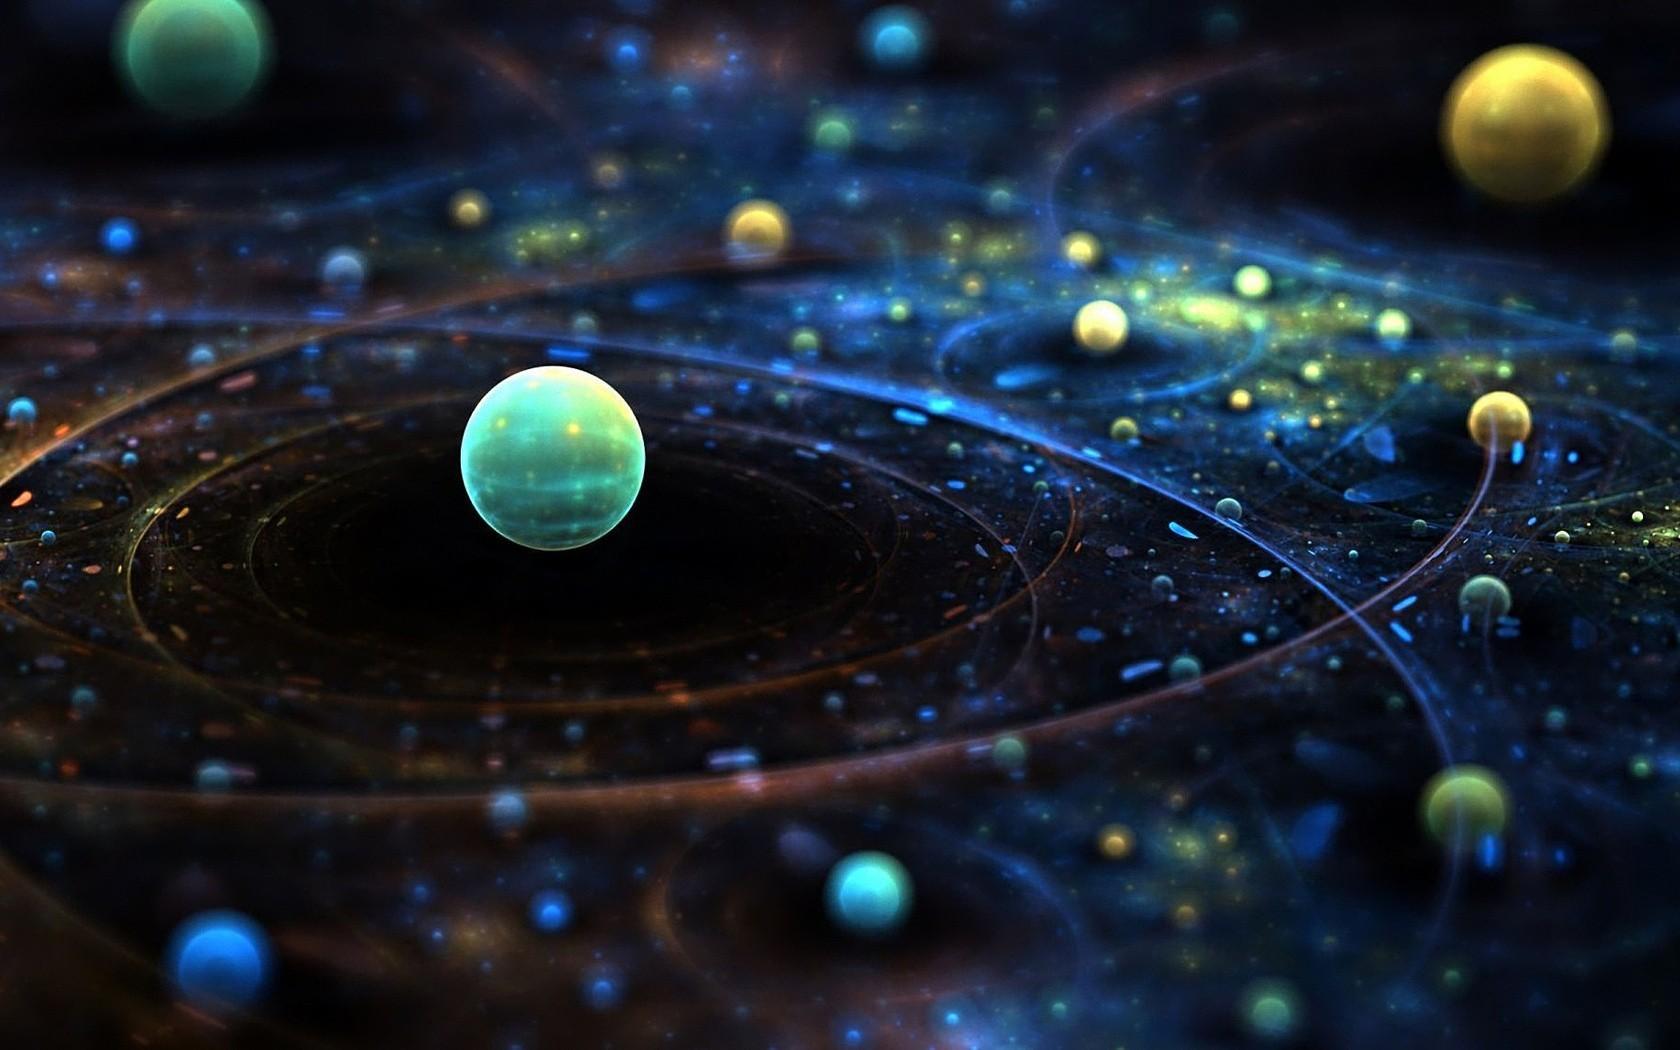 General 1680x1050 space art space planet digital art map CGI render 3D 3D Abstract abstract Solar System sphere tilt shift DeviantArt